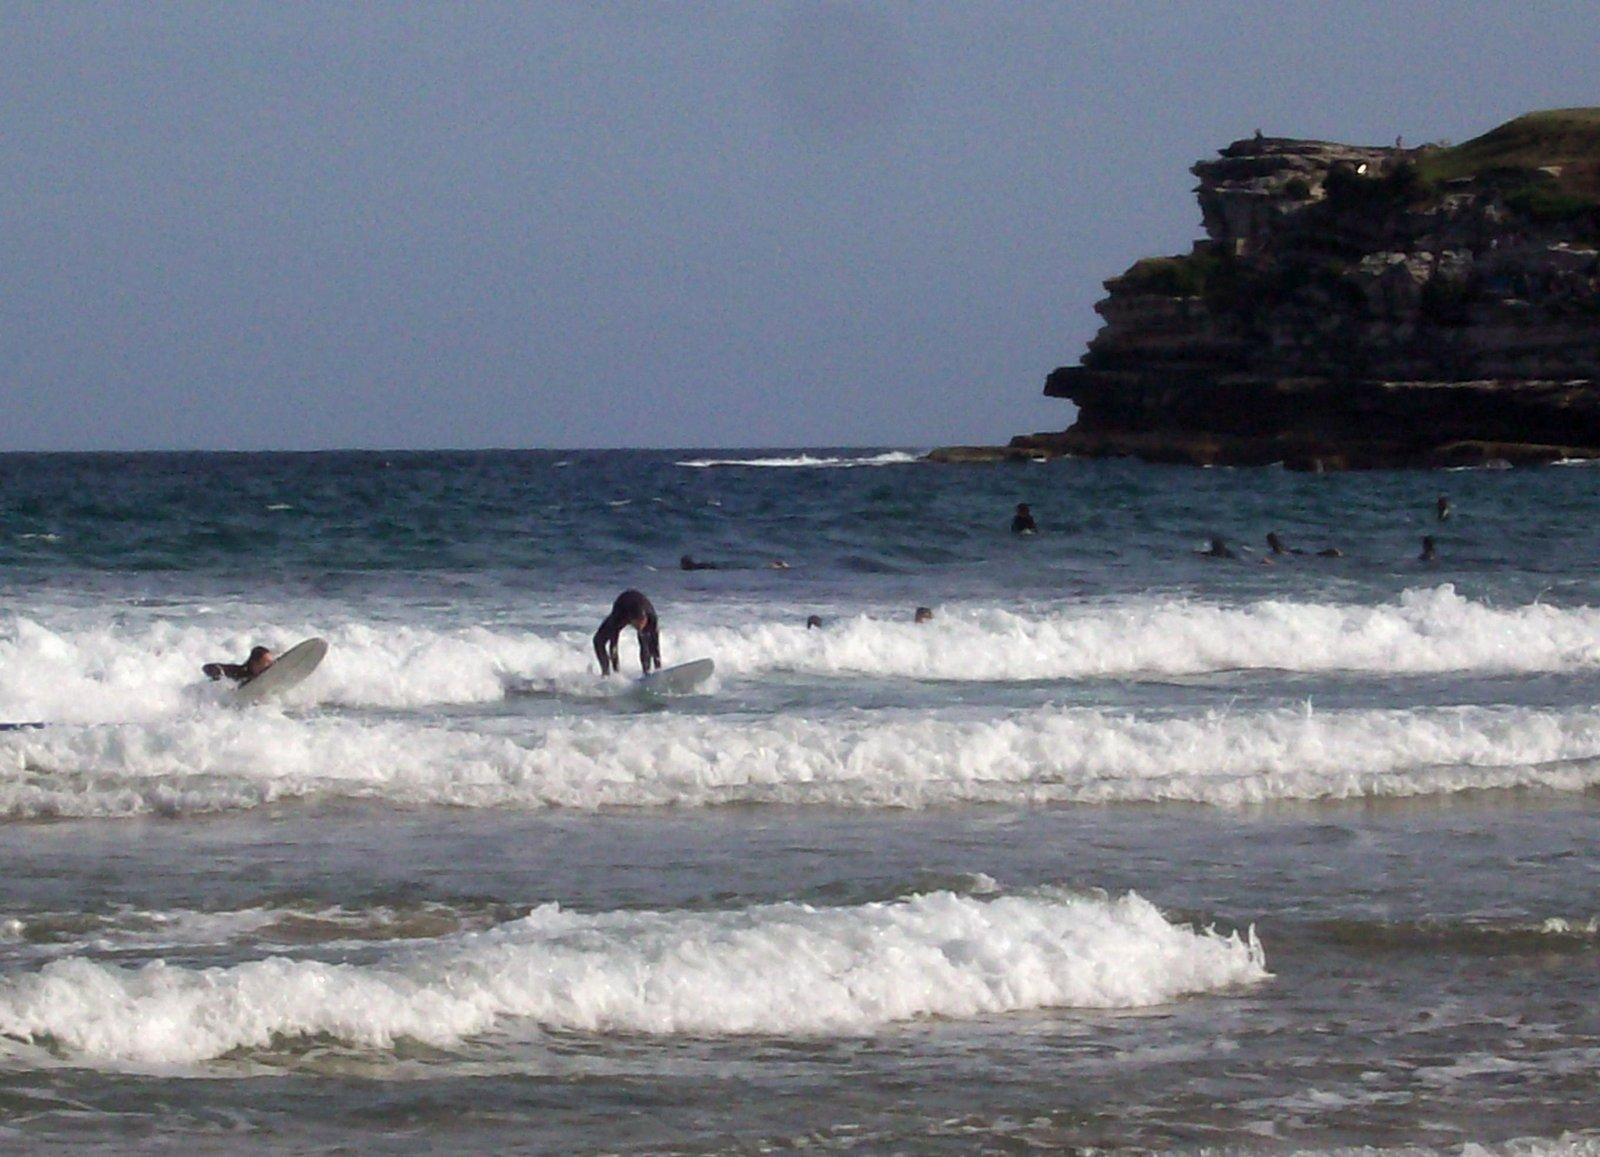 Surfer in Bondi Beach